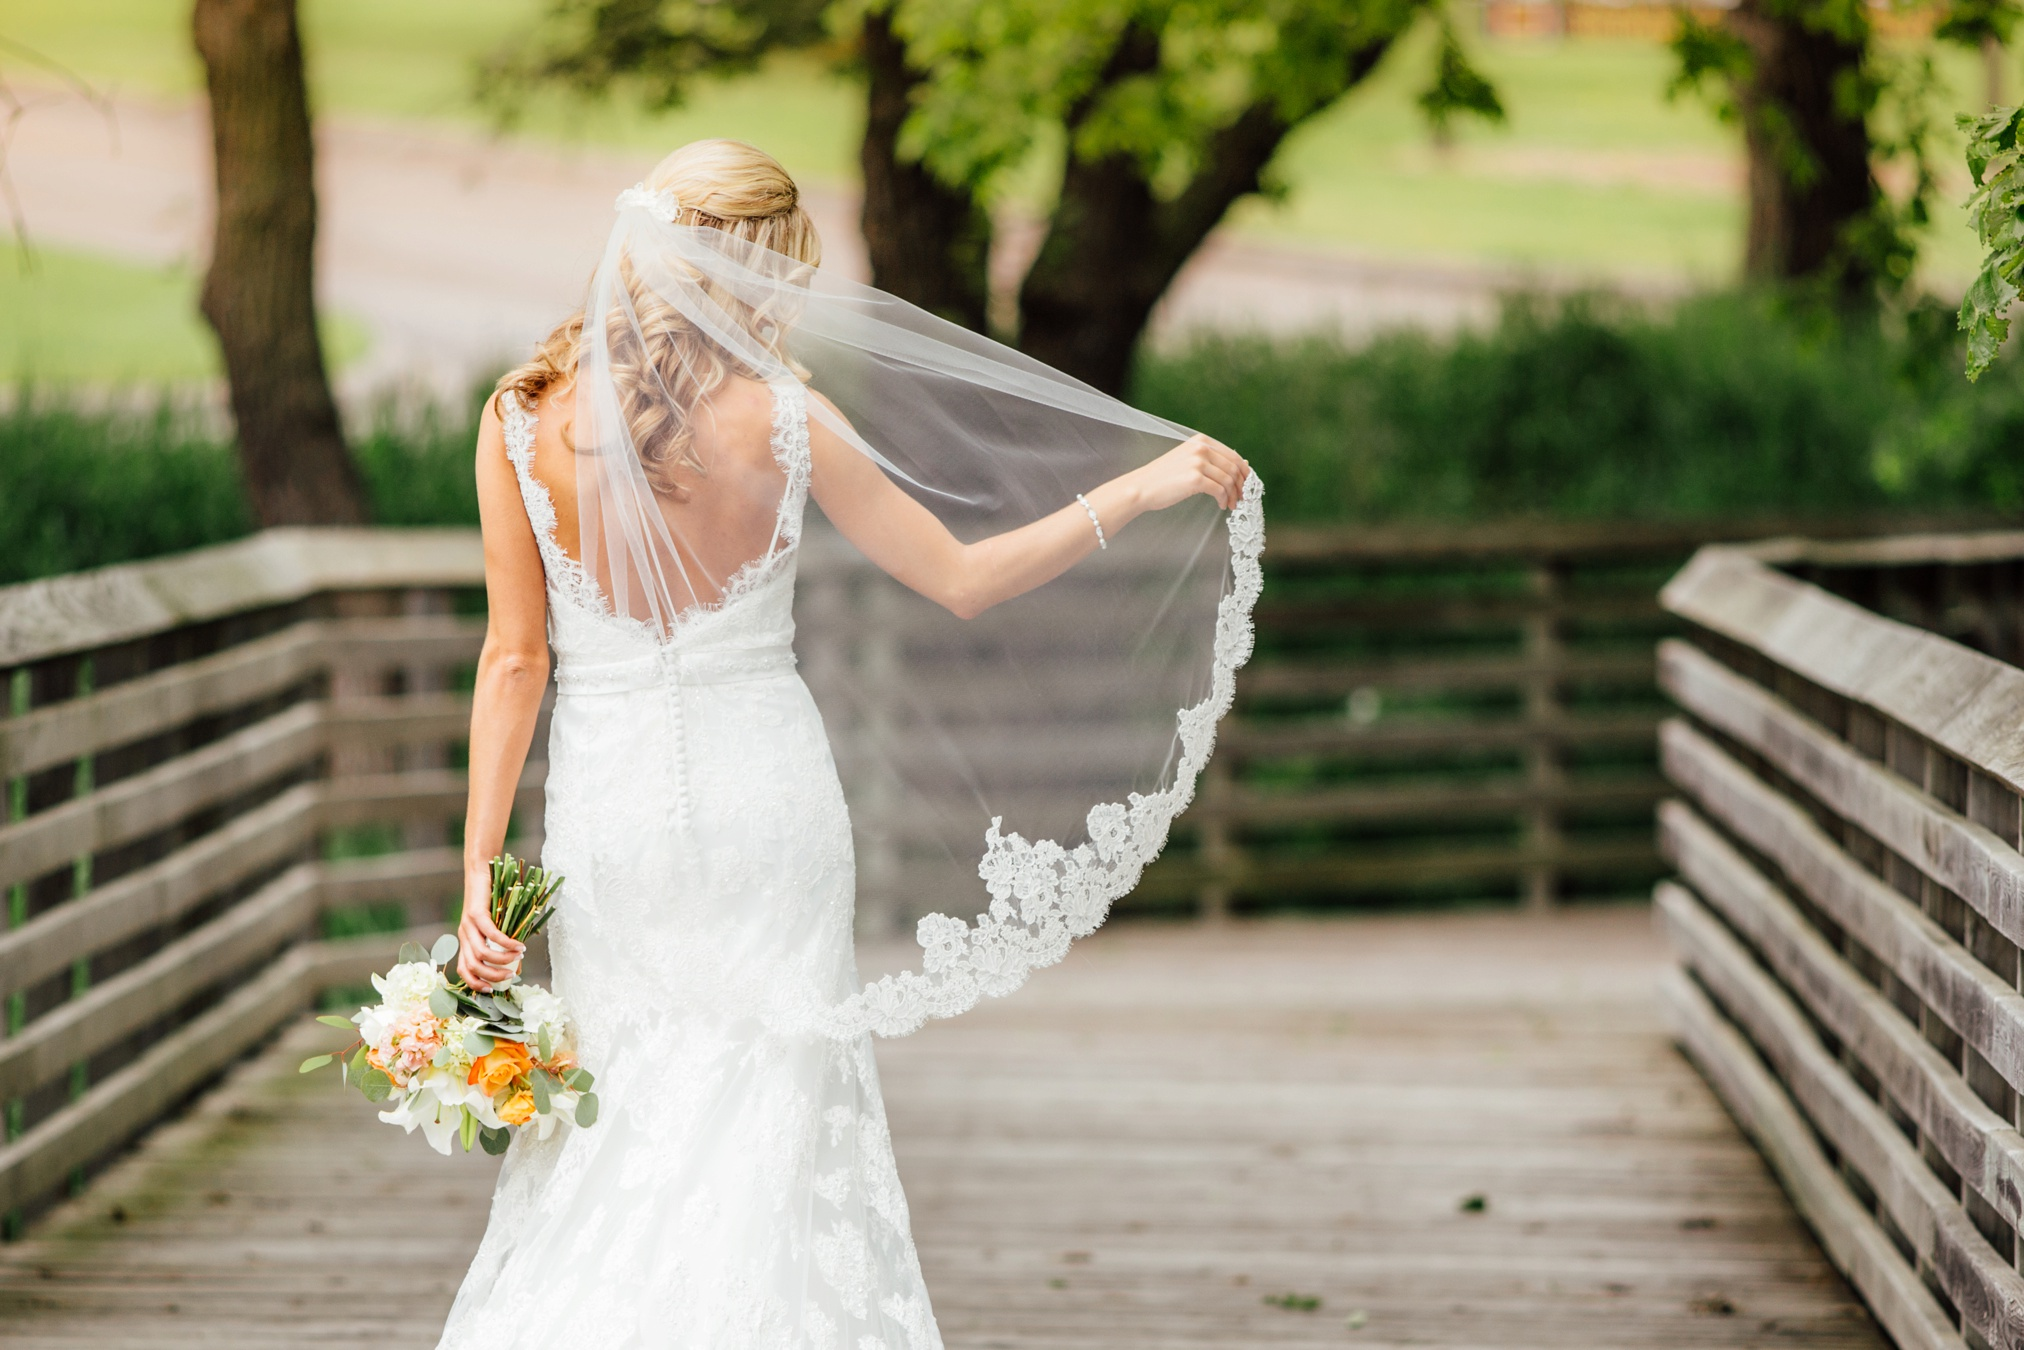 schmid_wedding-110.jpg